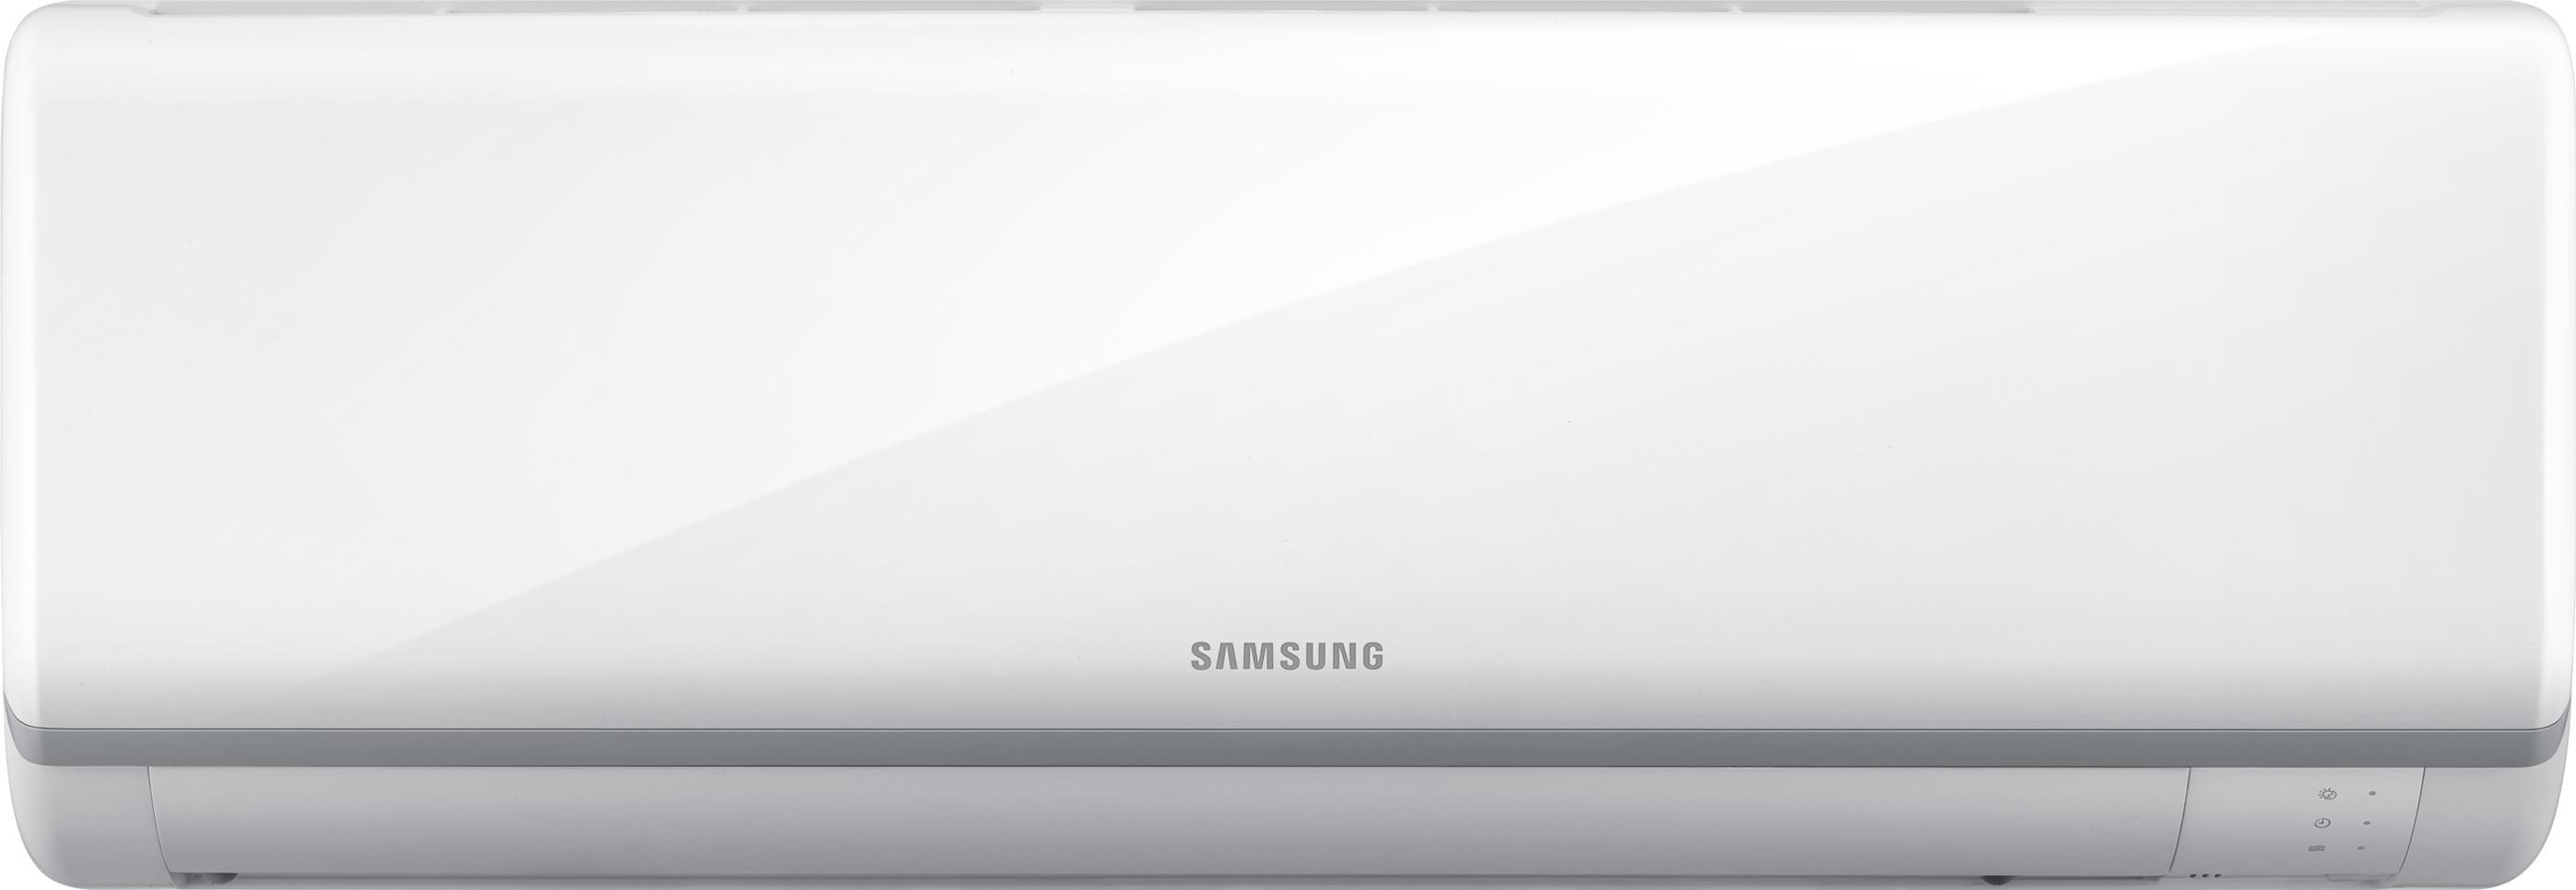 Samsung AS12TSL